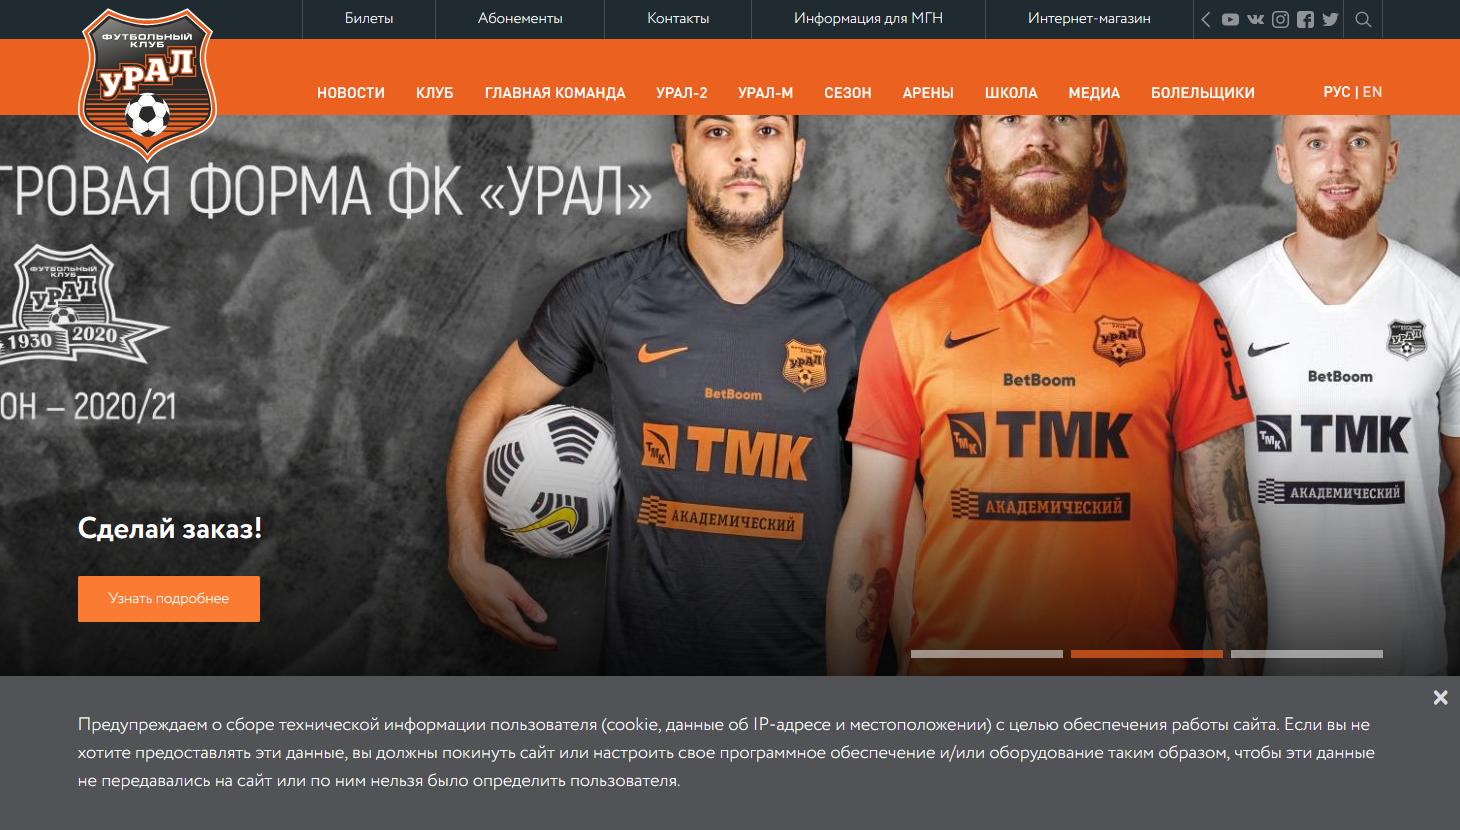 FC Ural Yekaterinburg